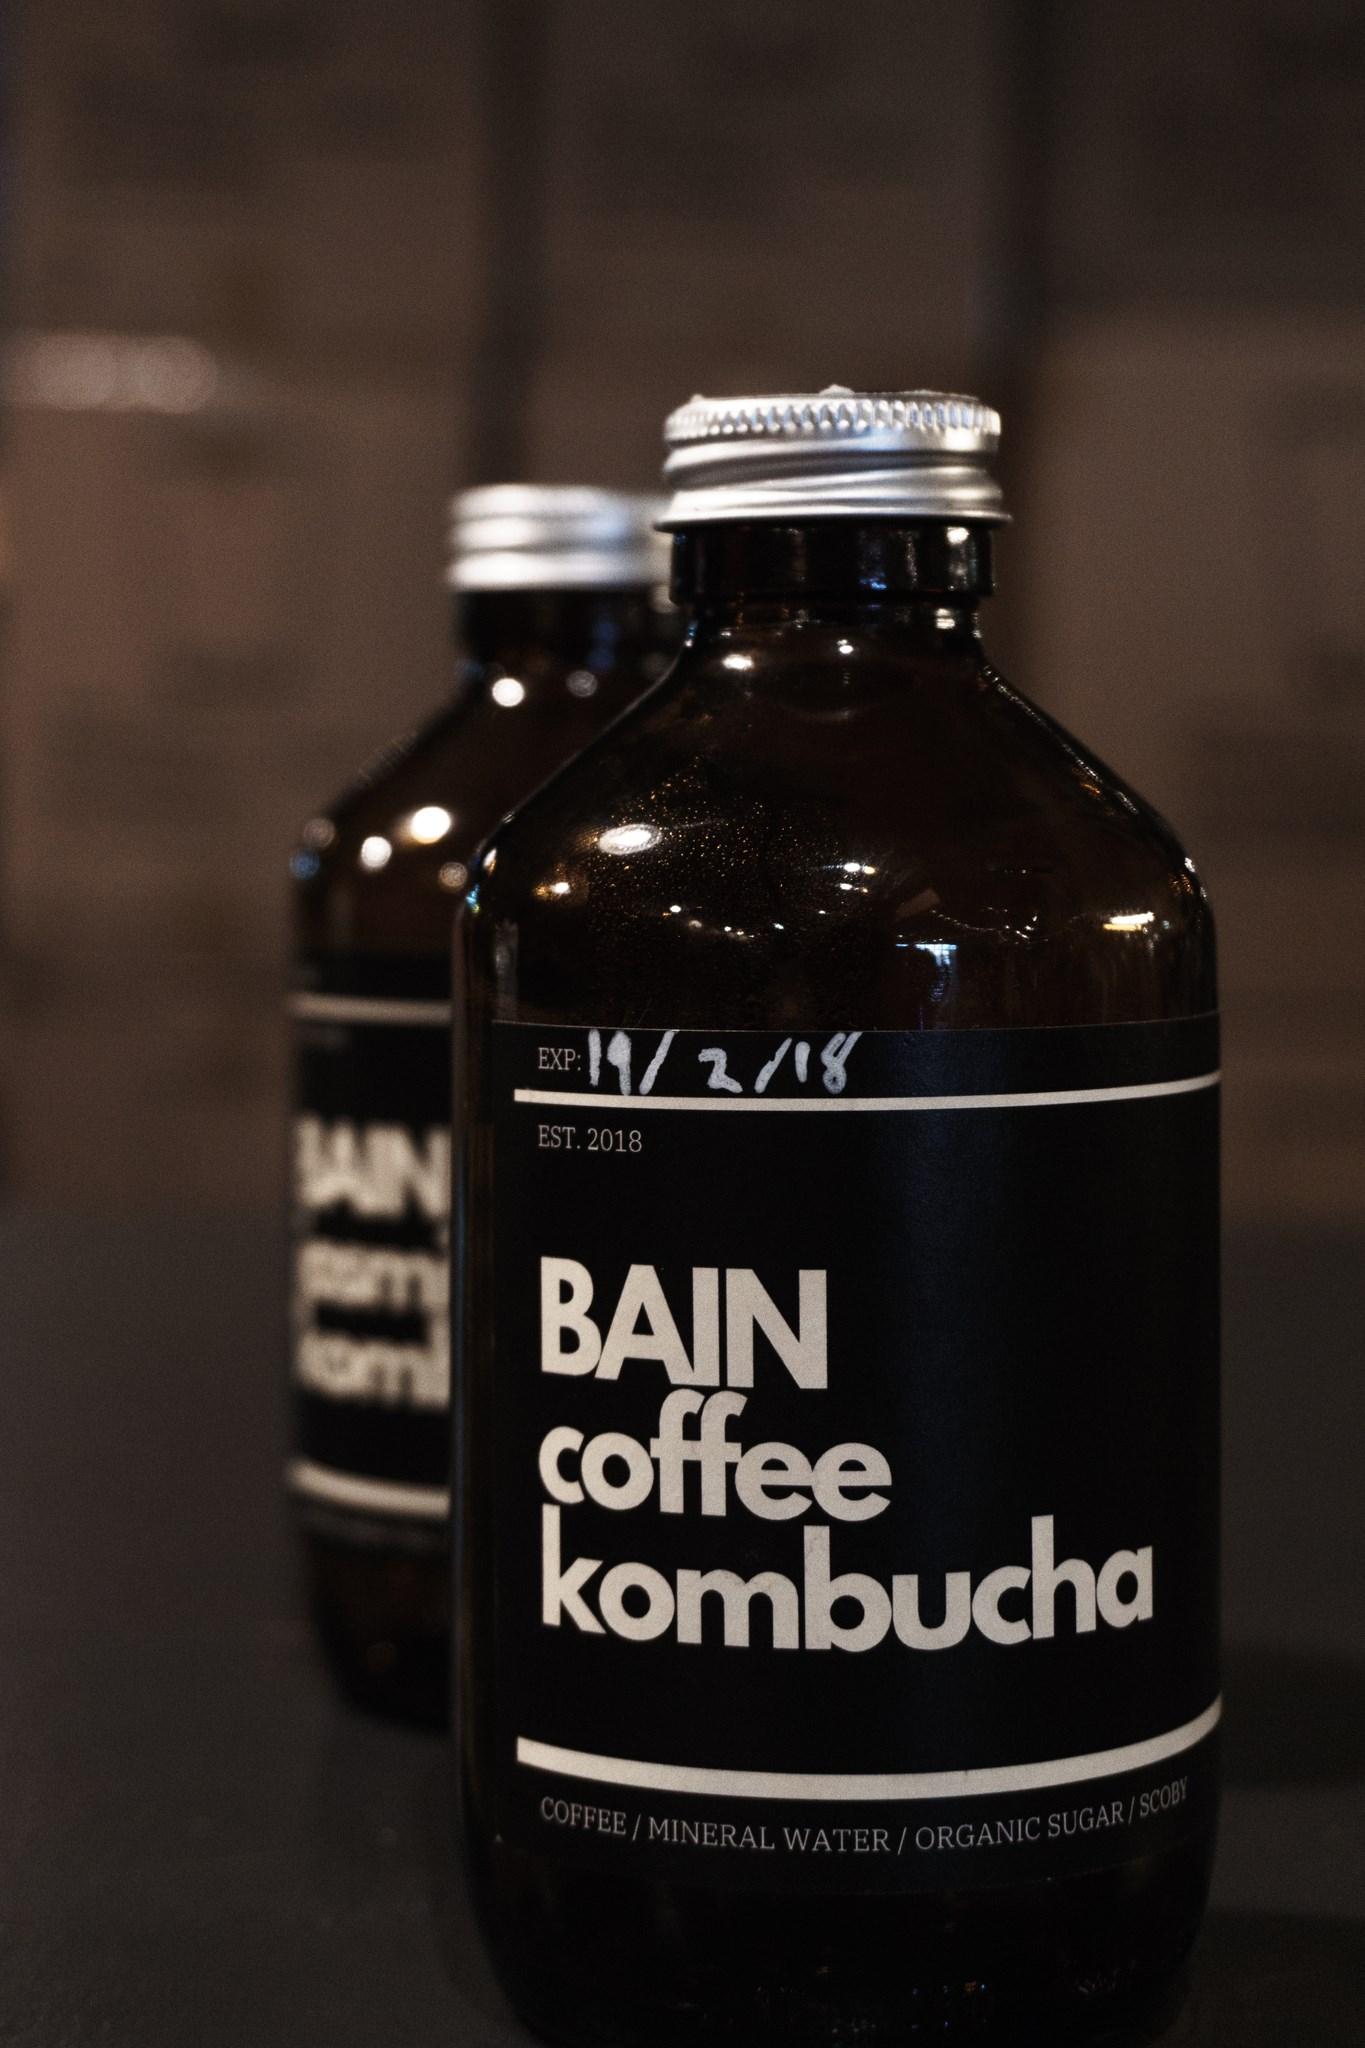 BAIN koffie kombuch